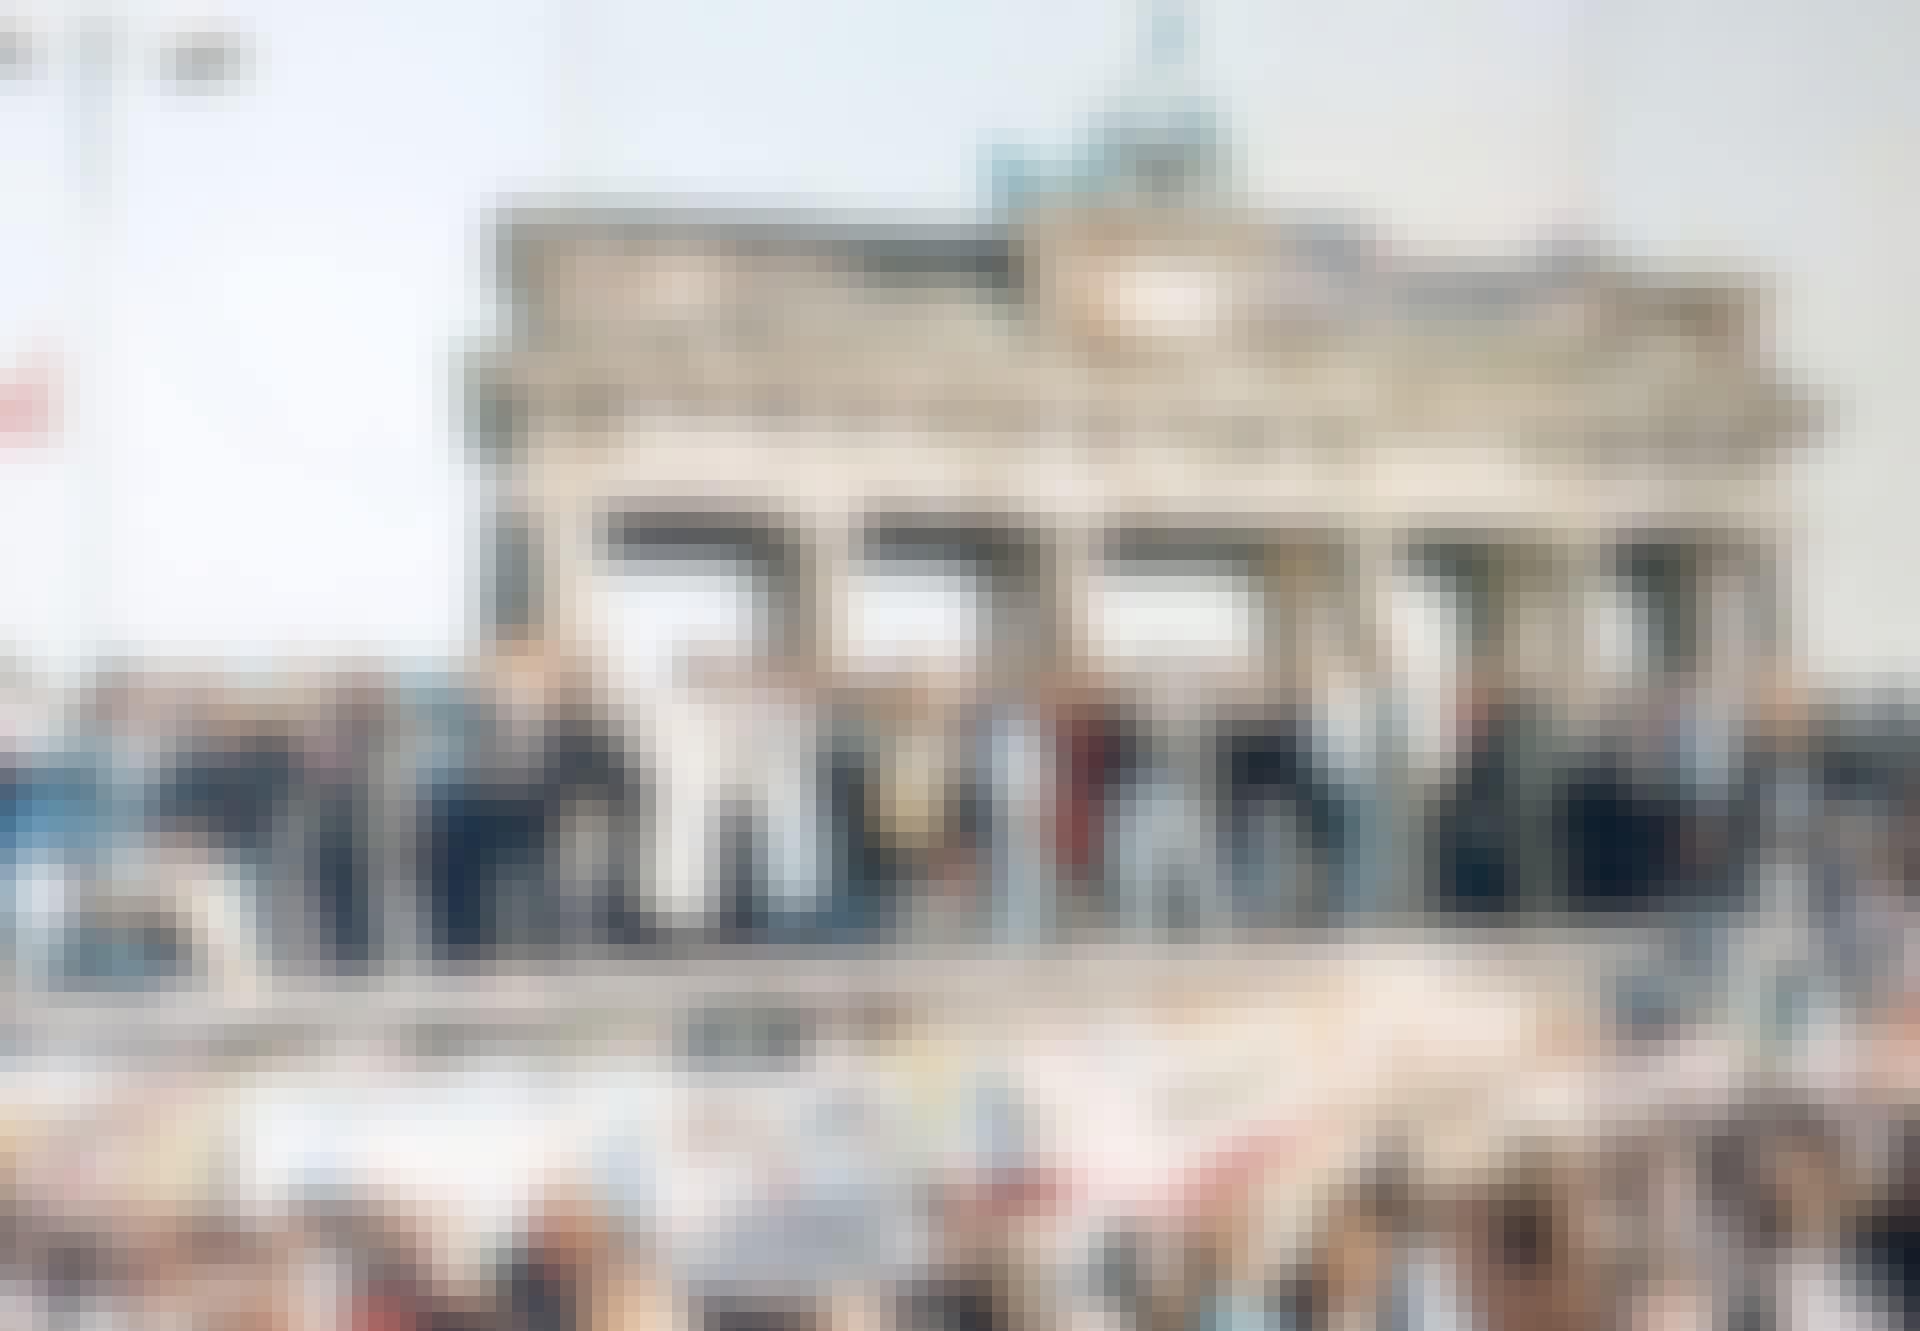 Mennesker står på Berlinmuren foran Brandenburger Tor